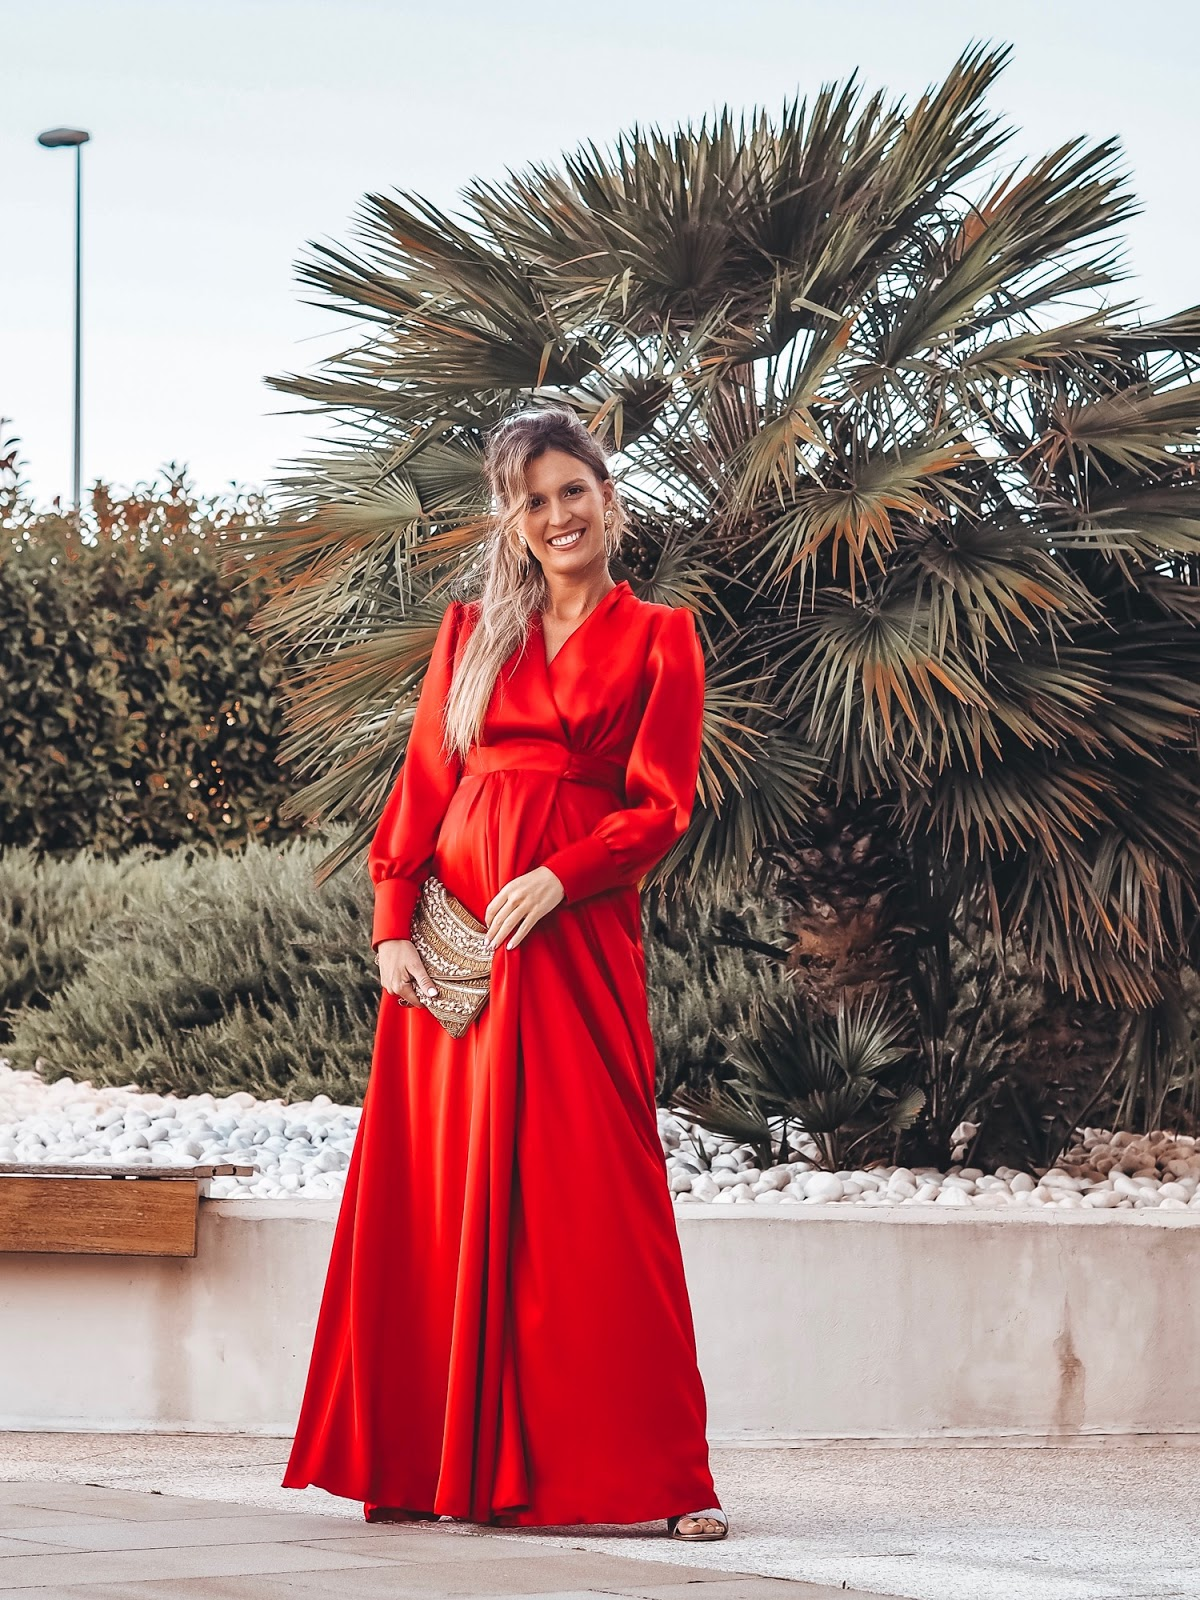 invitada noche embarazada 2019